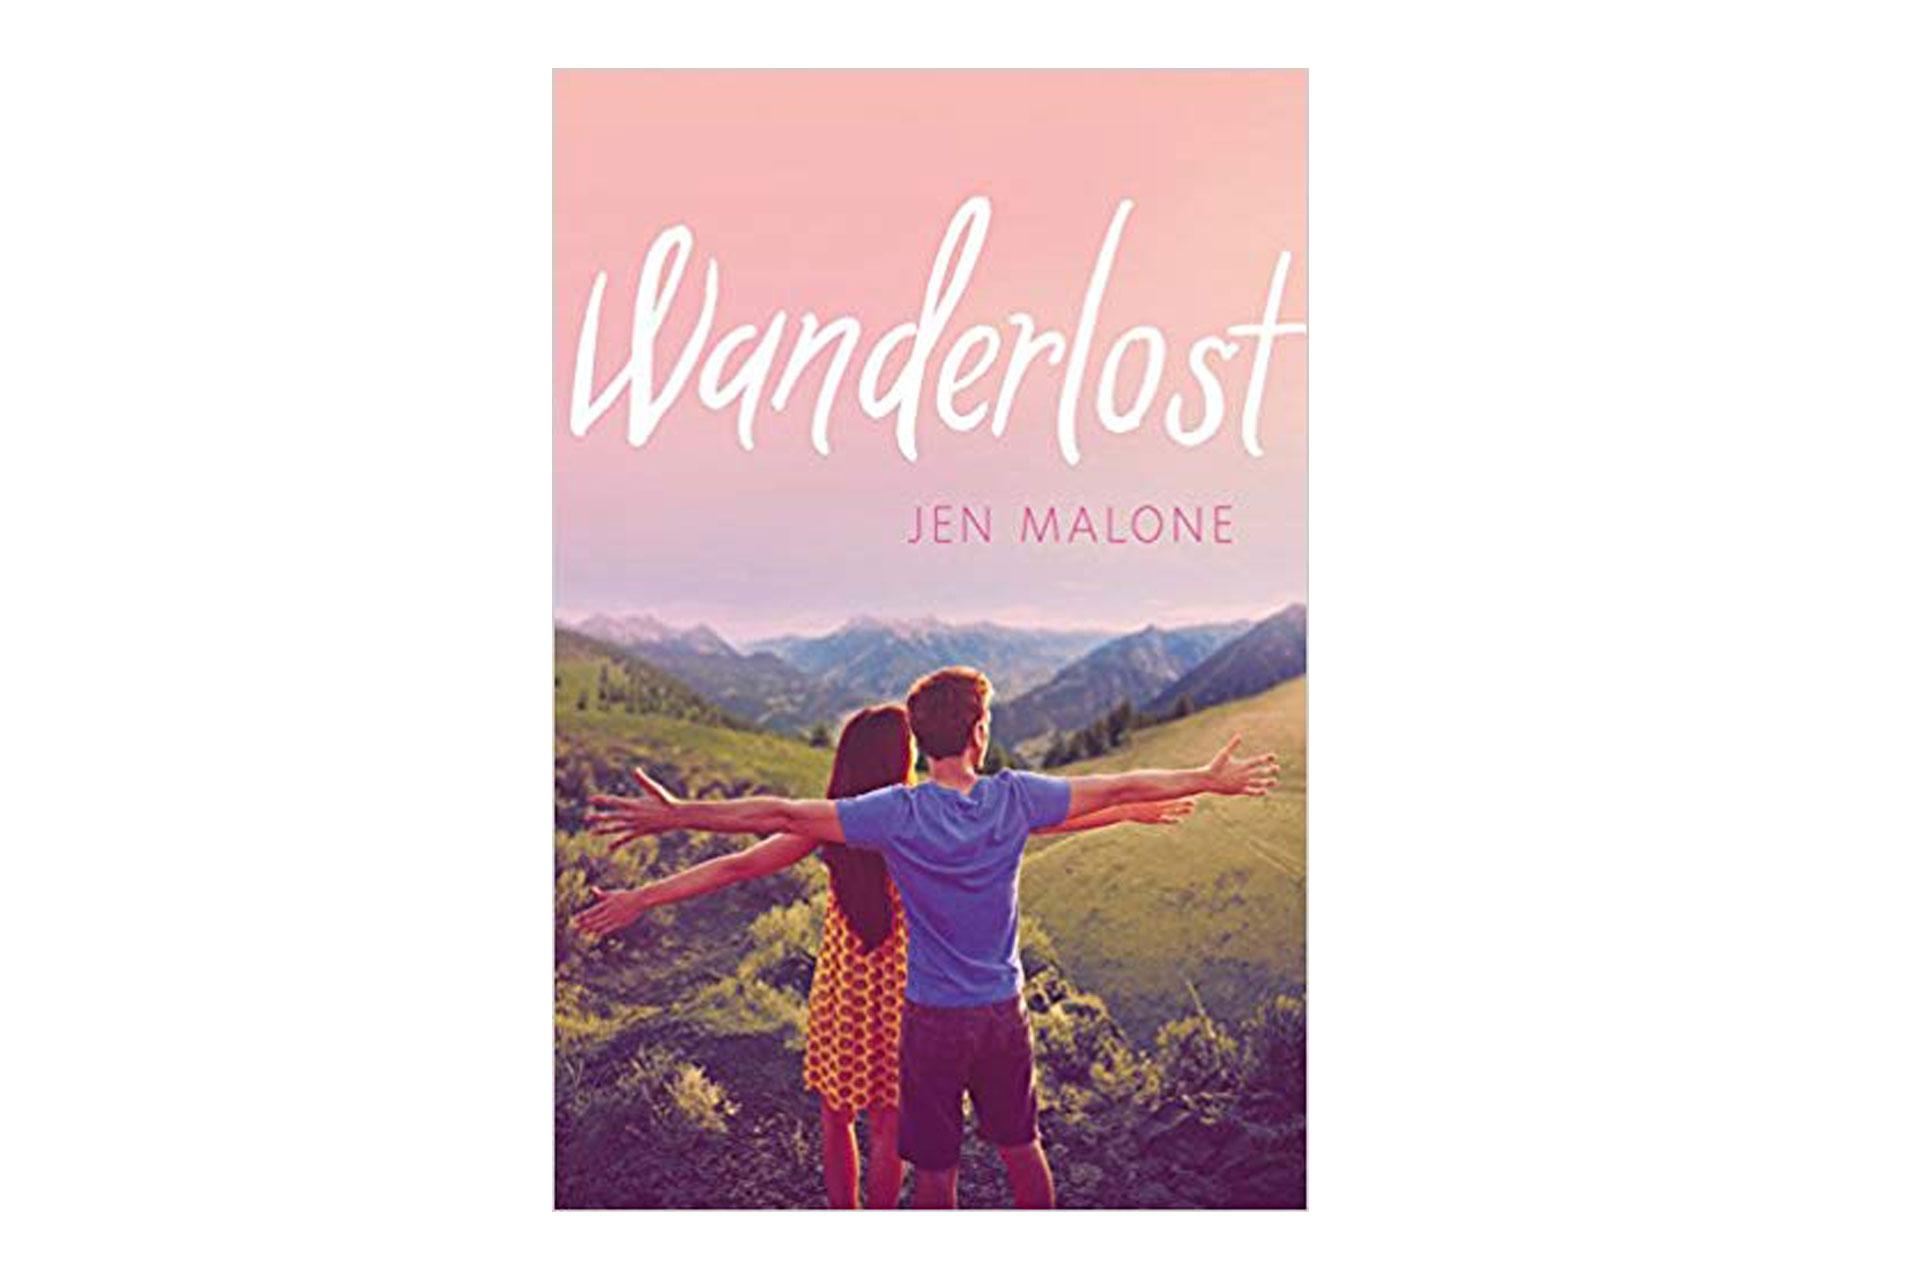 Wanderlost Book; Courtesy of Amazon